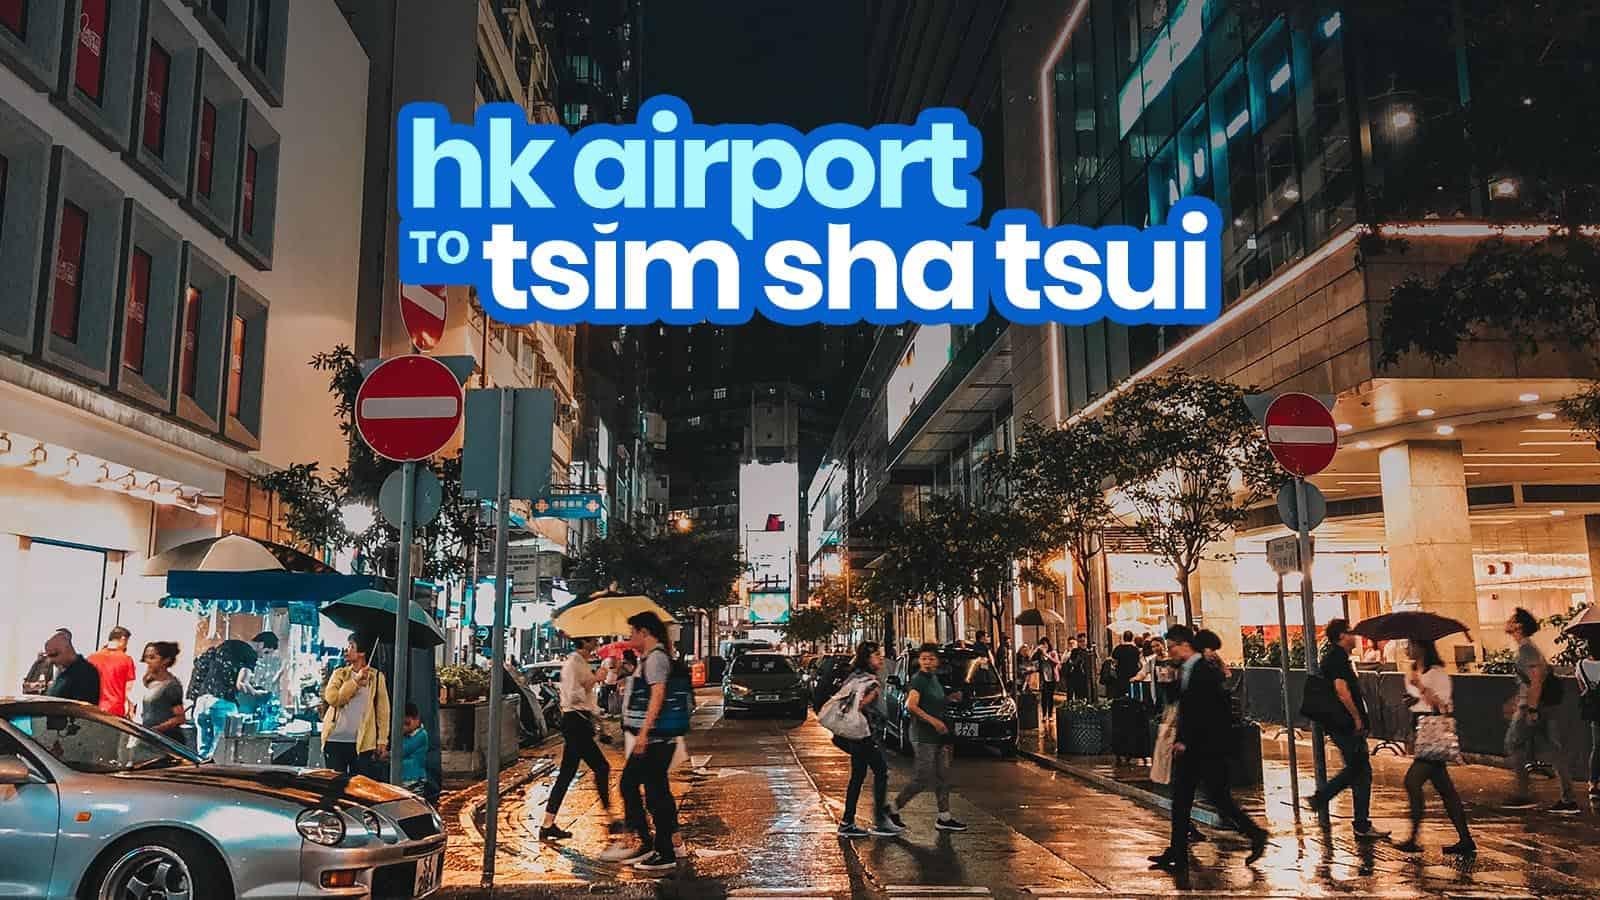 Hong Kong Airport To Tsim Sha Tsui By Train By Bus The